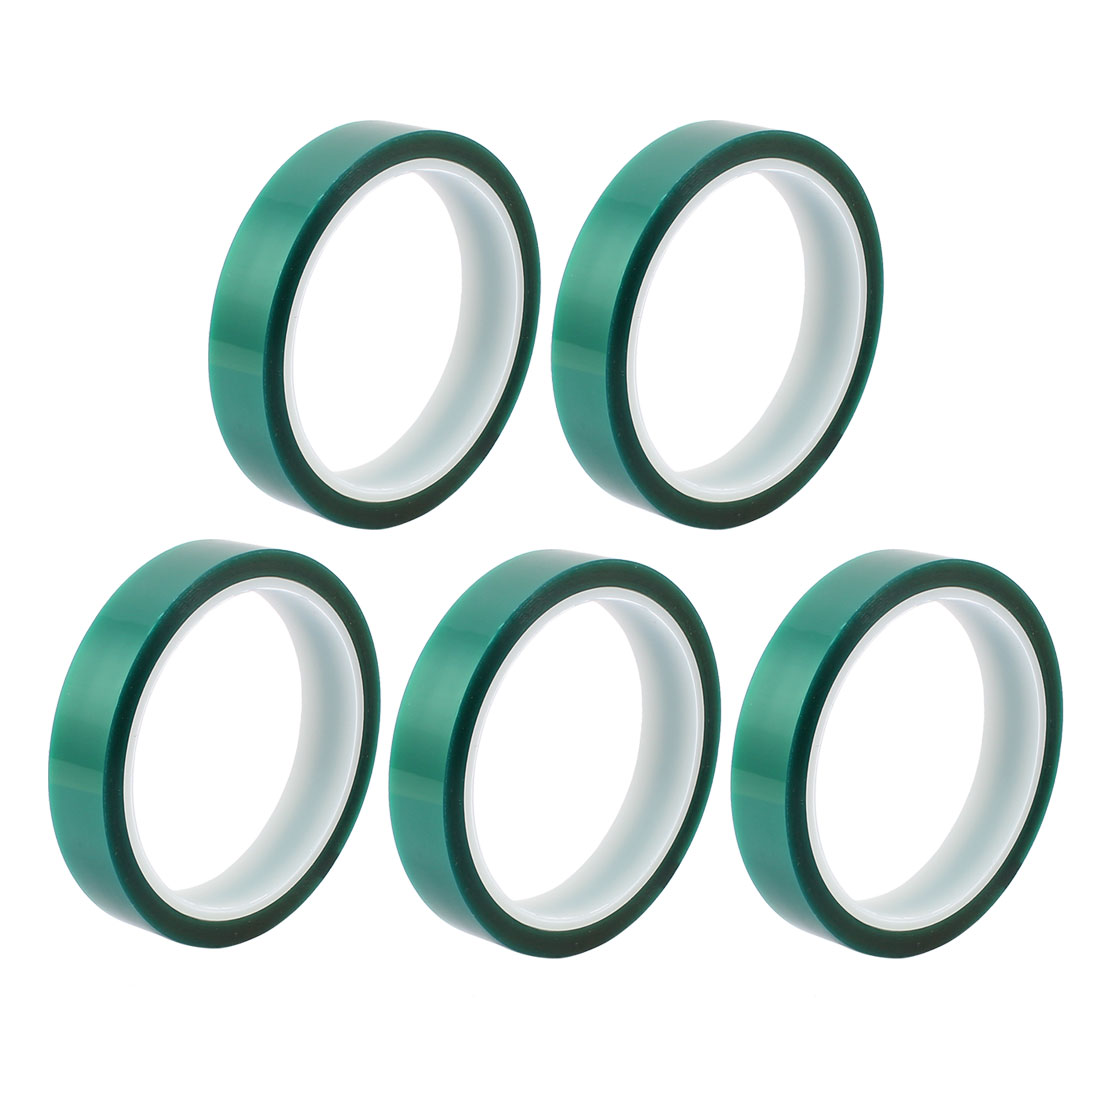 5pcs 20mm Width 33M Long Green PET High Temperature Heat Resistant PCB Solder Tape